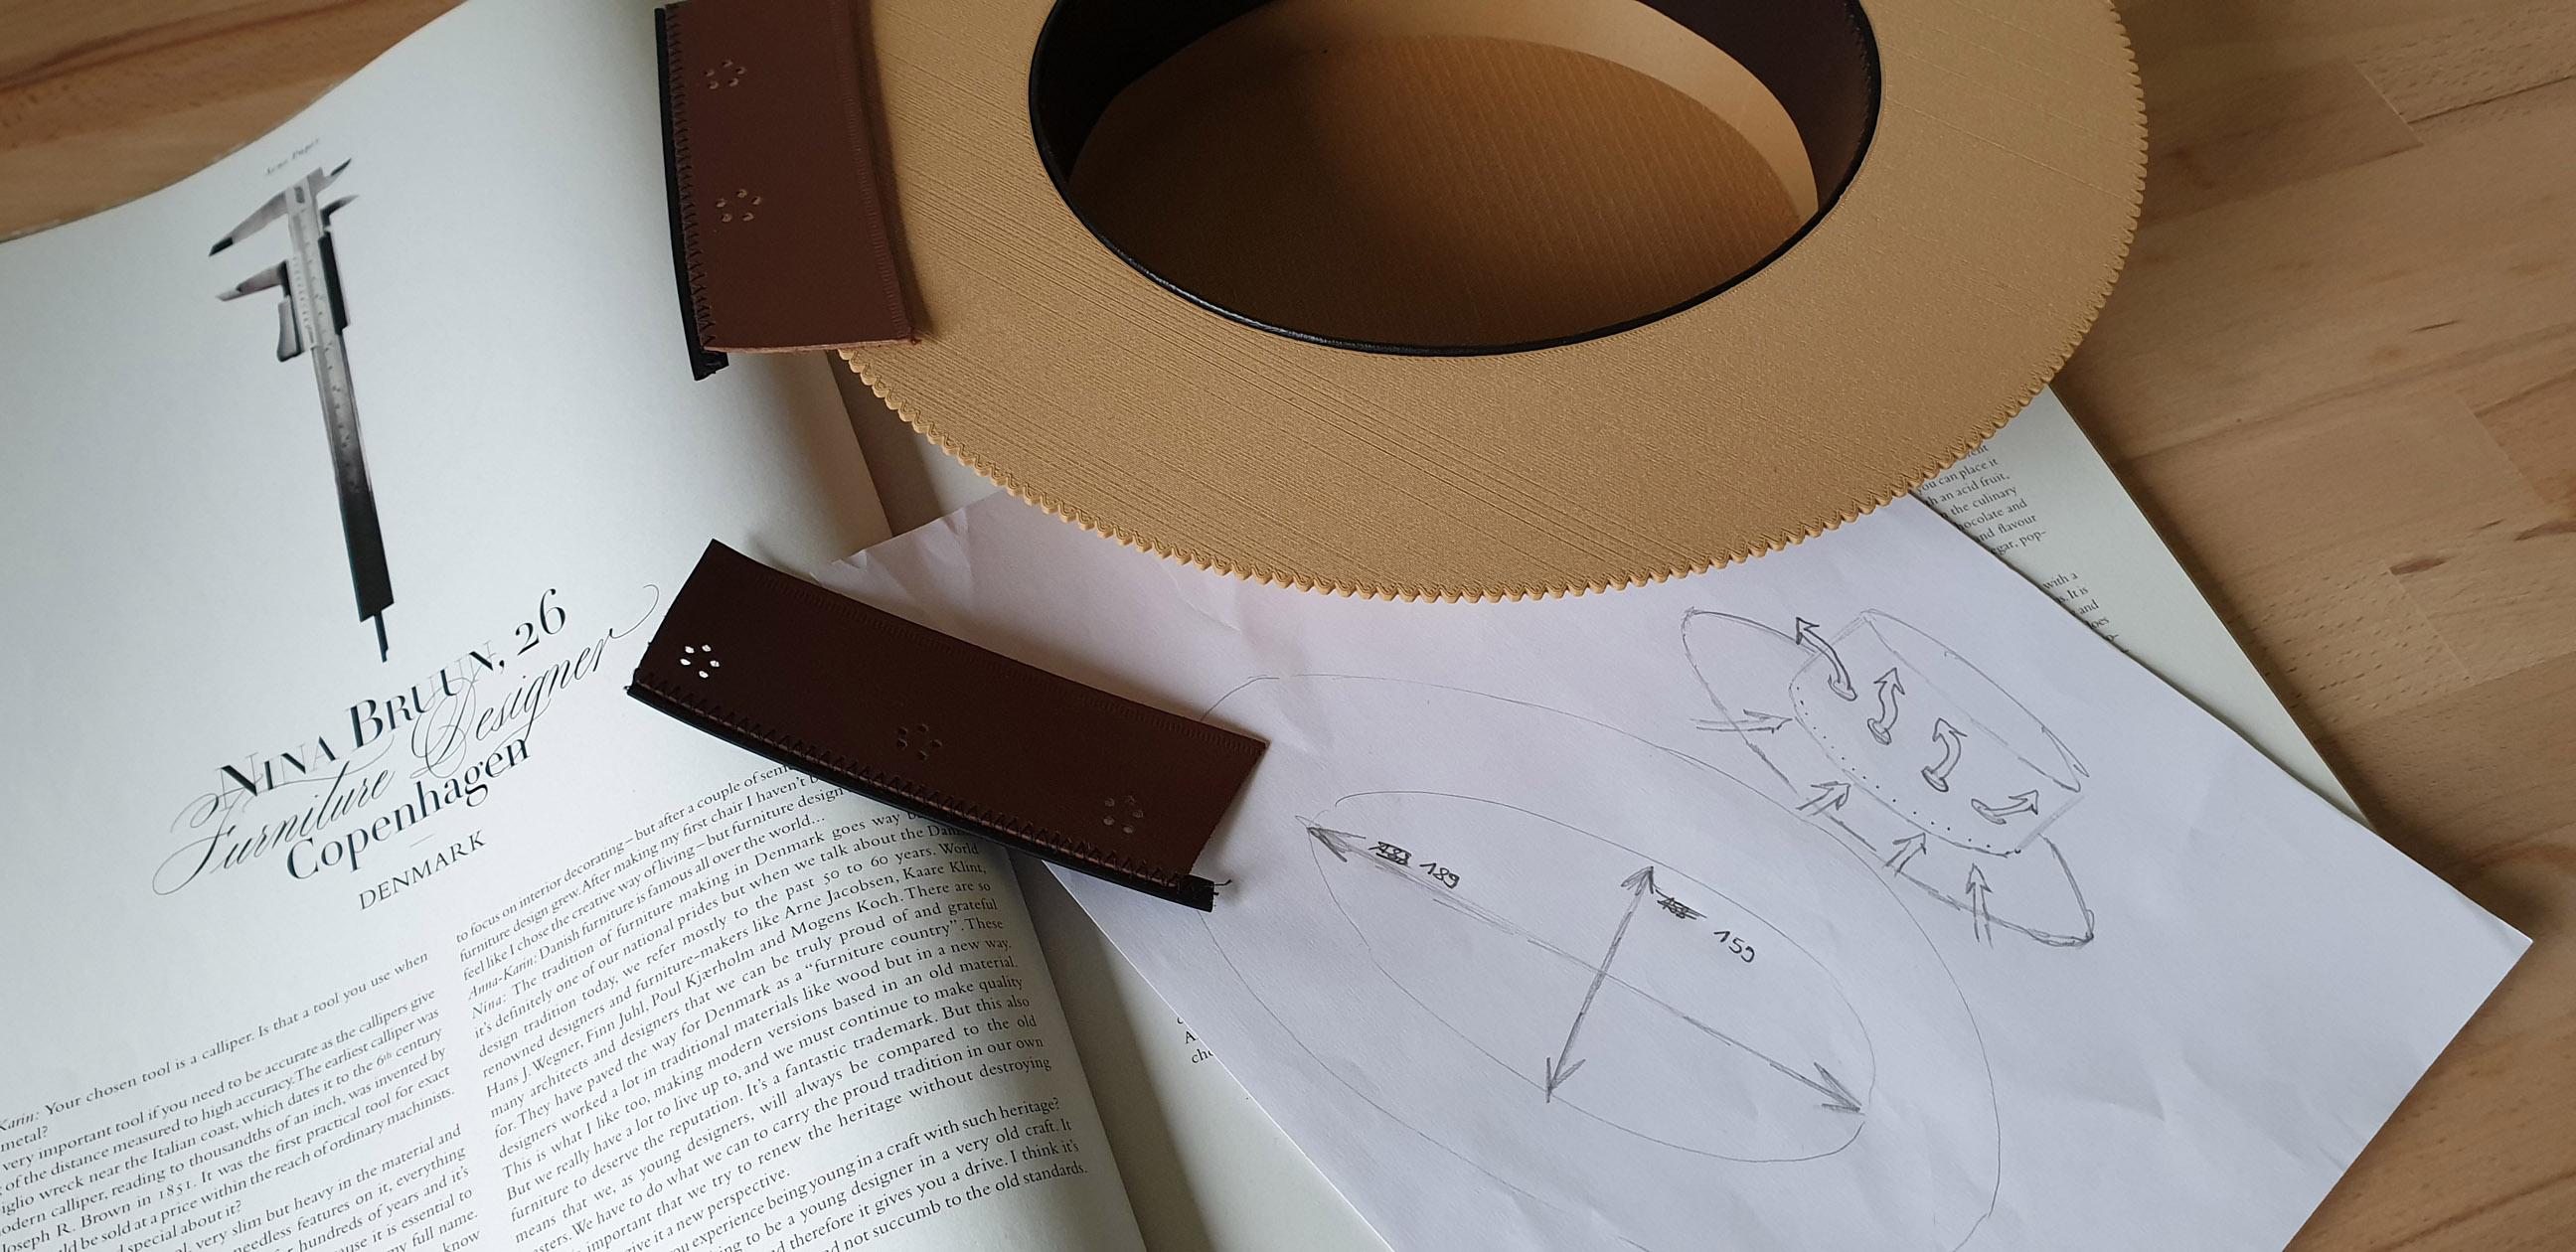 WORLD'S FIRST 3D PRINTED BOATER HAT - Kanotier z drukarki 3D by LONG STORY SHORT